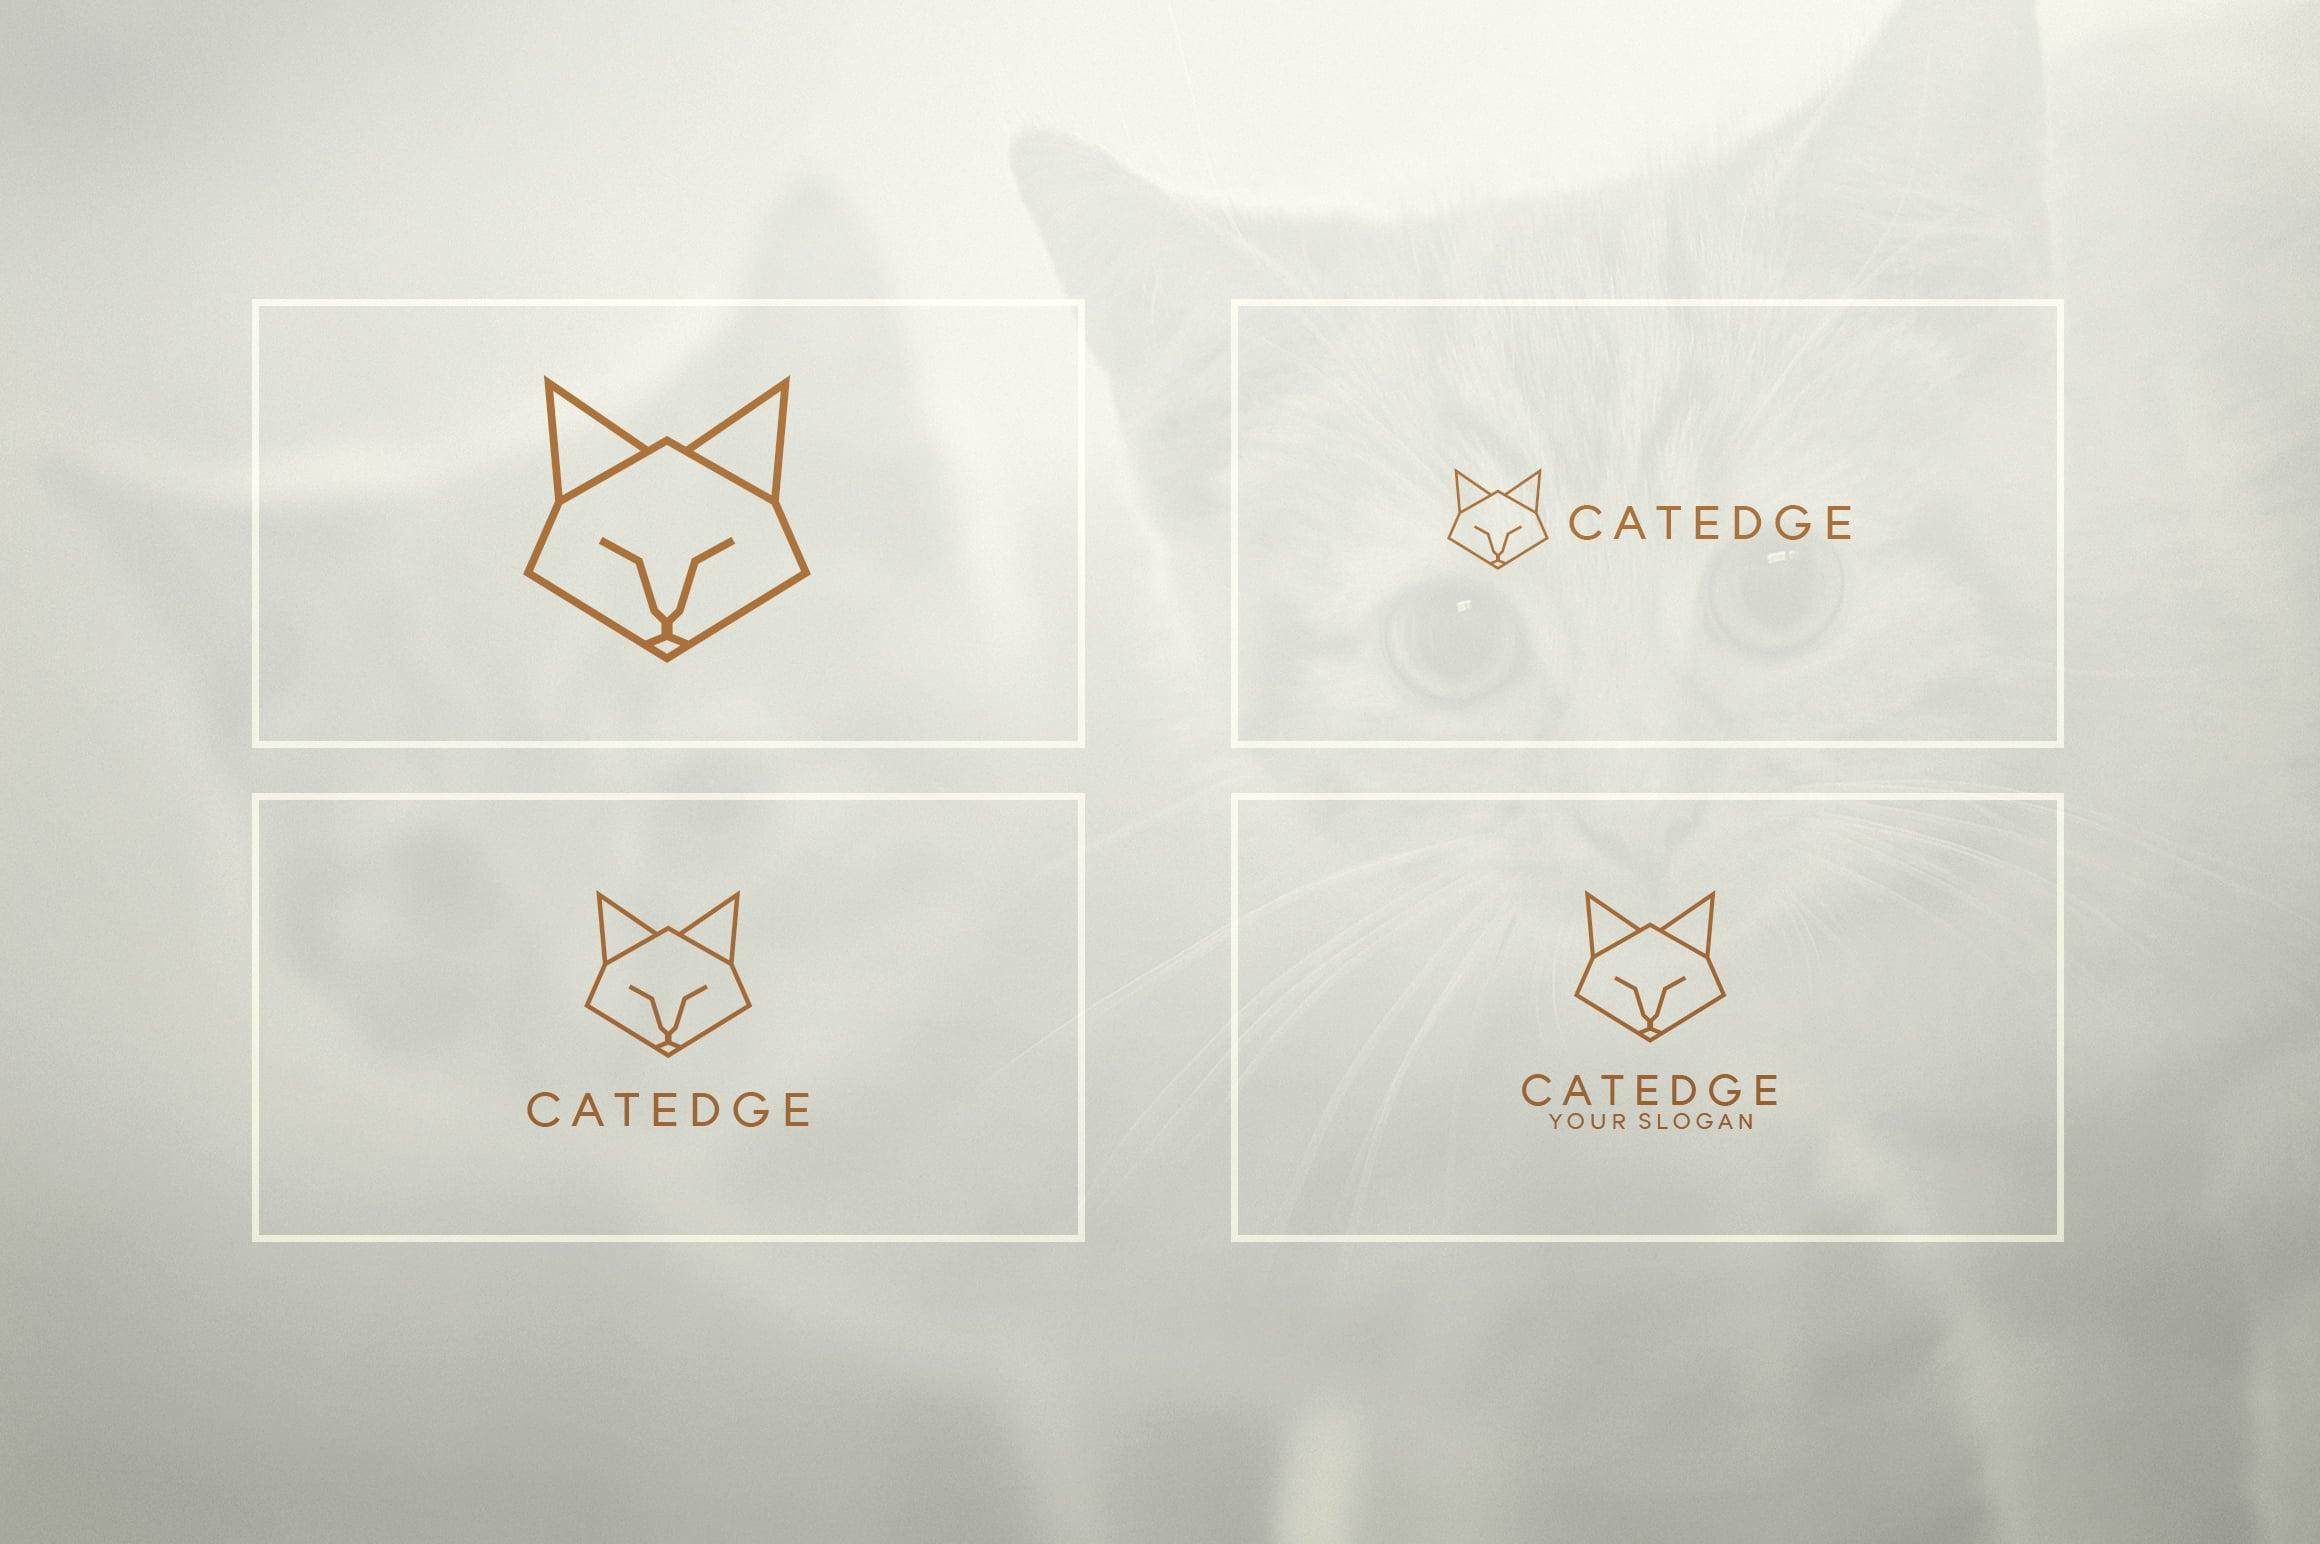 17 Geometric Animal Icons and Logos - 11